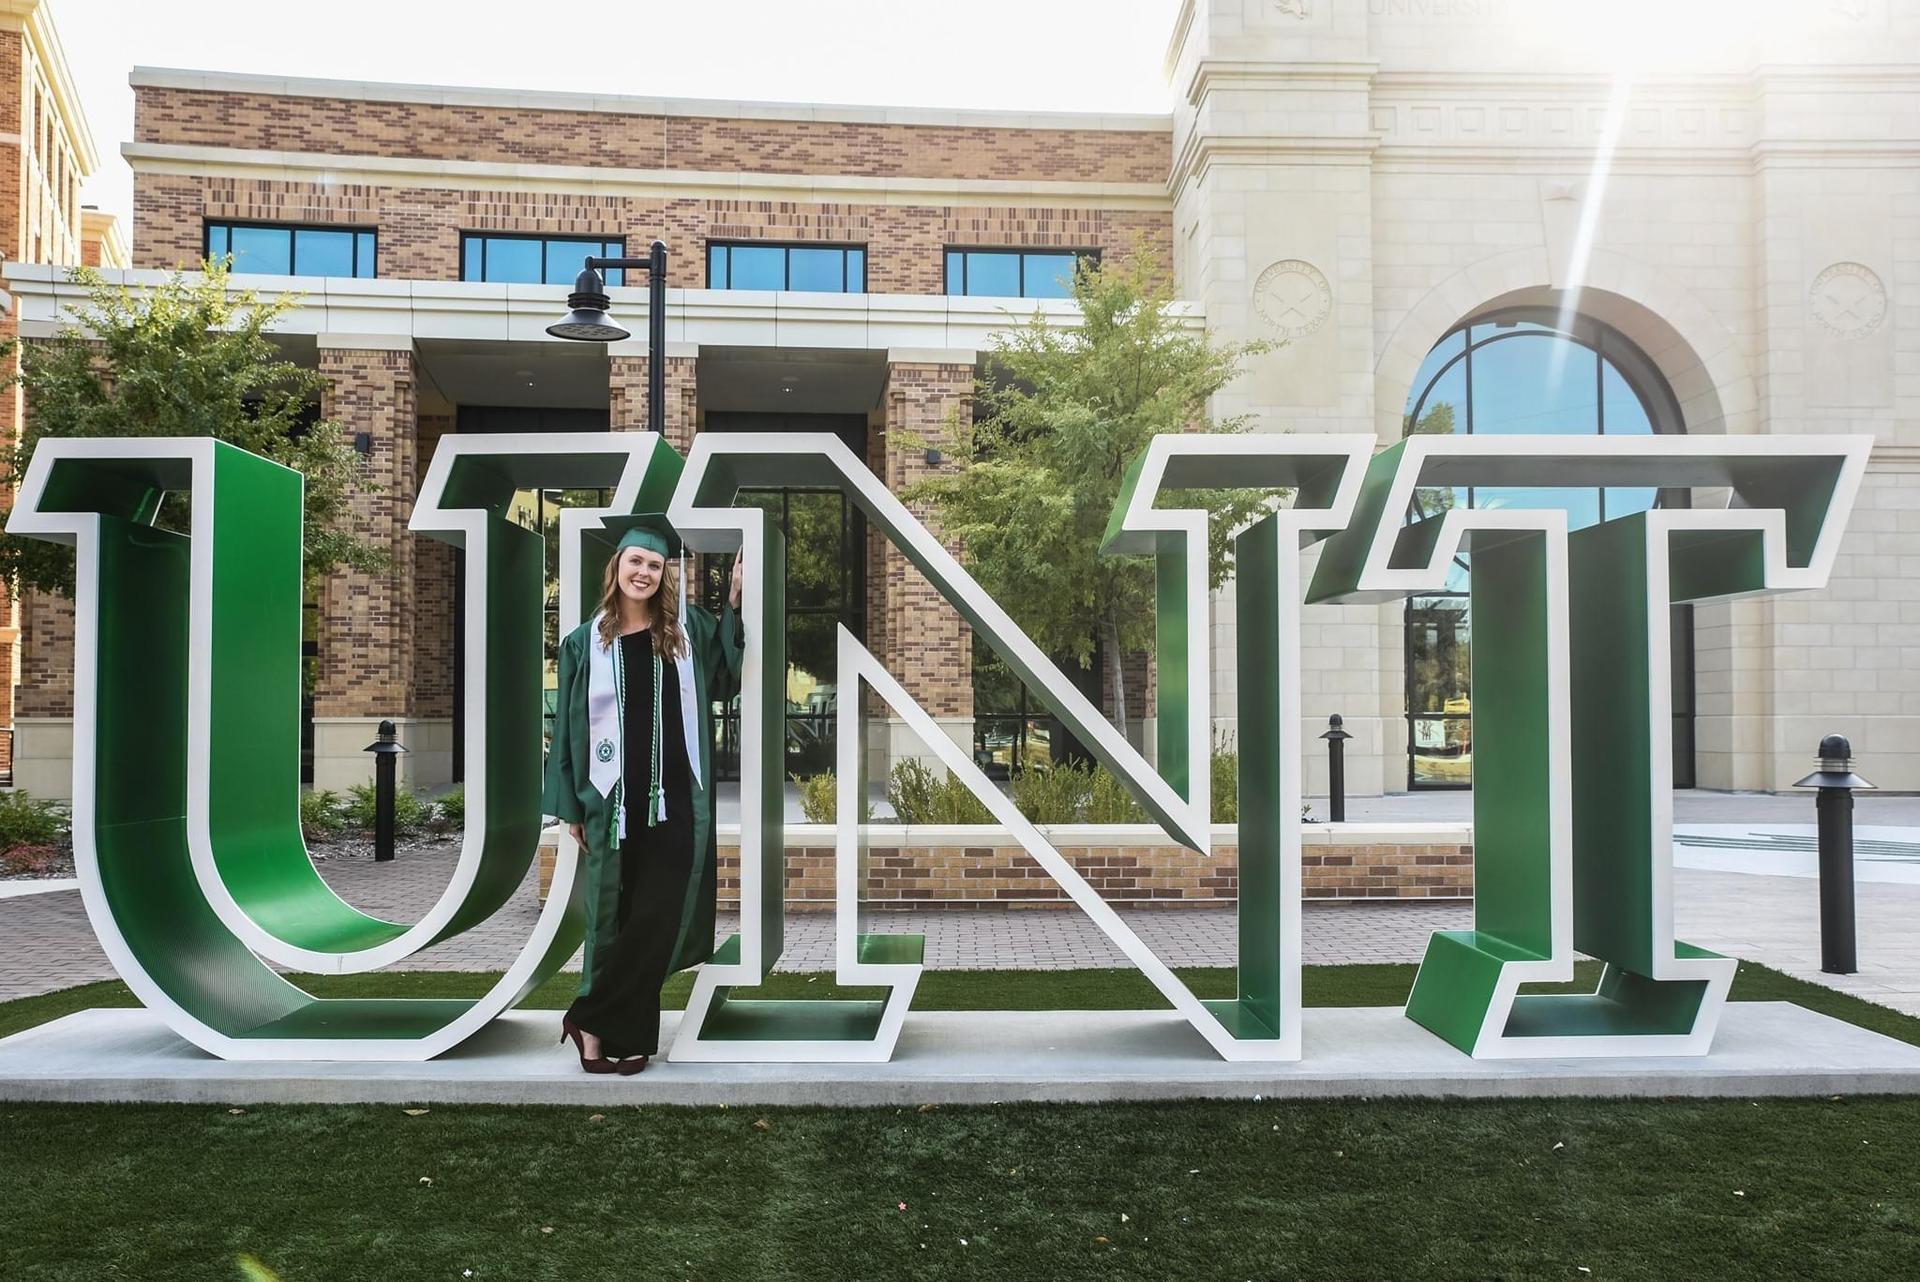 Graduation Portrait of Ms. Belokin at the University of North Texas